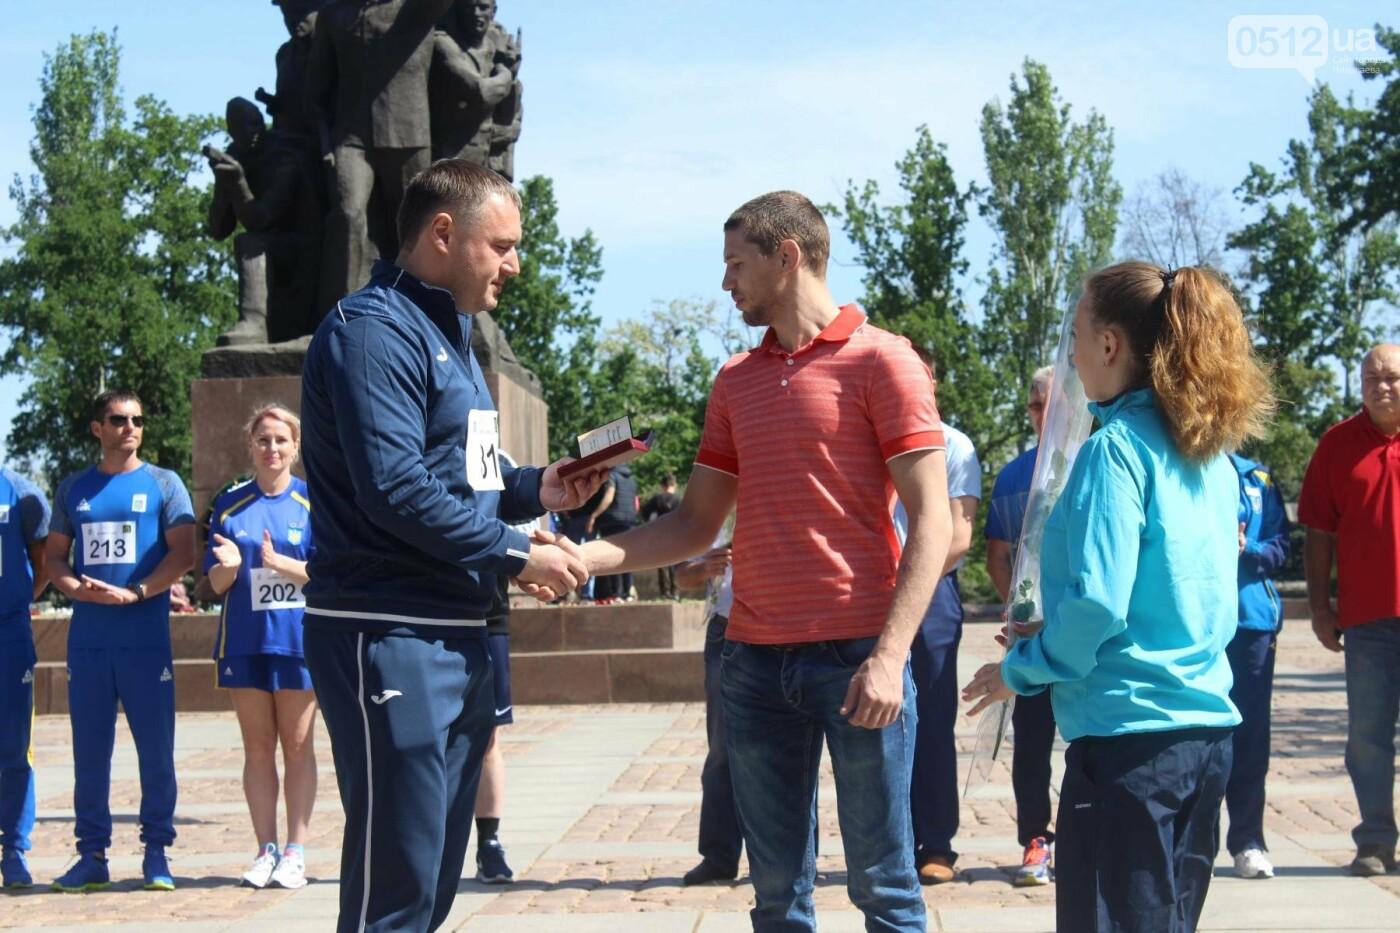 В Николаеве на день олимпийца спортсменам вручили награды и ключи от нового автобуса, - ФОТО , фото-4